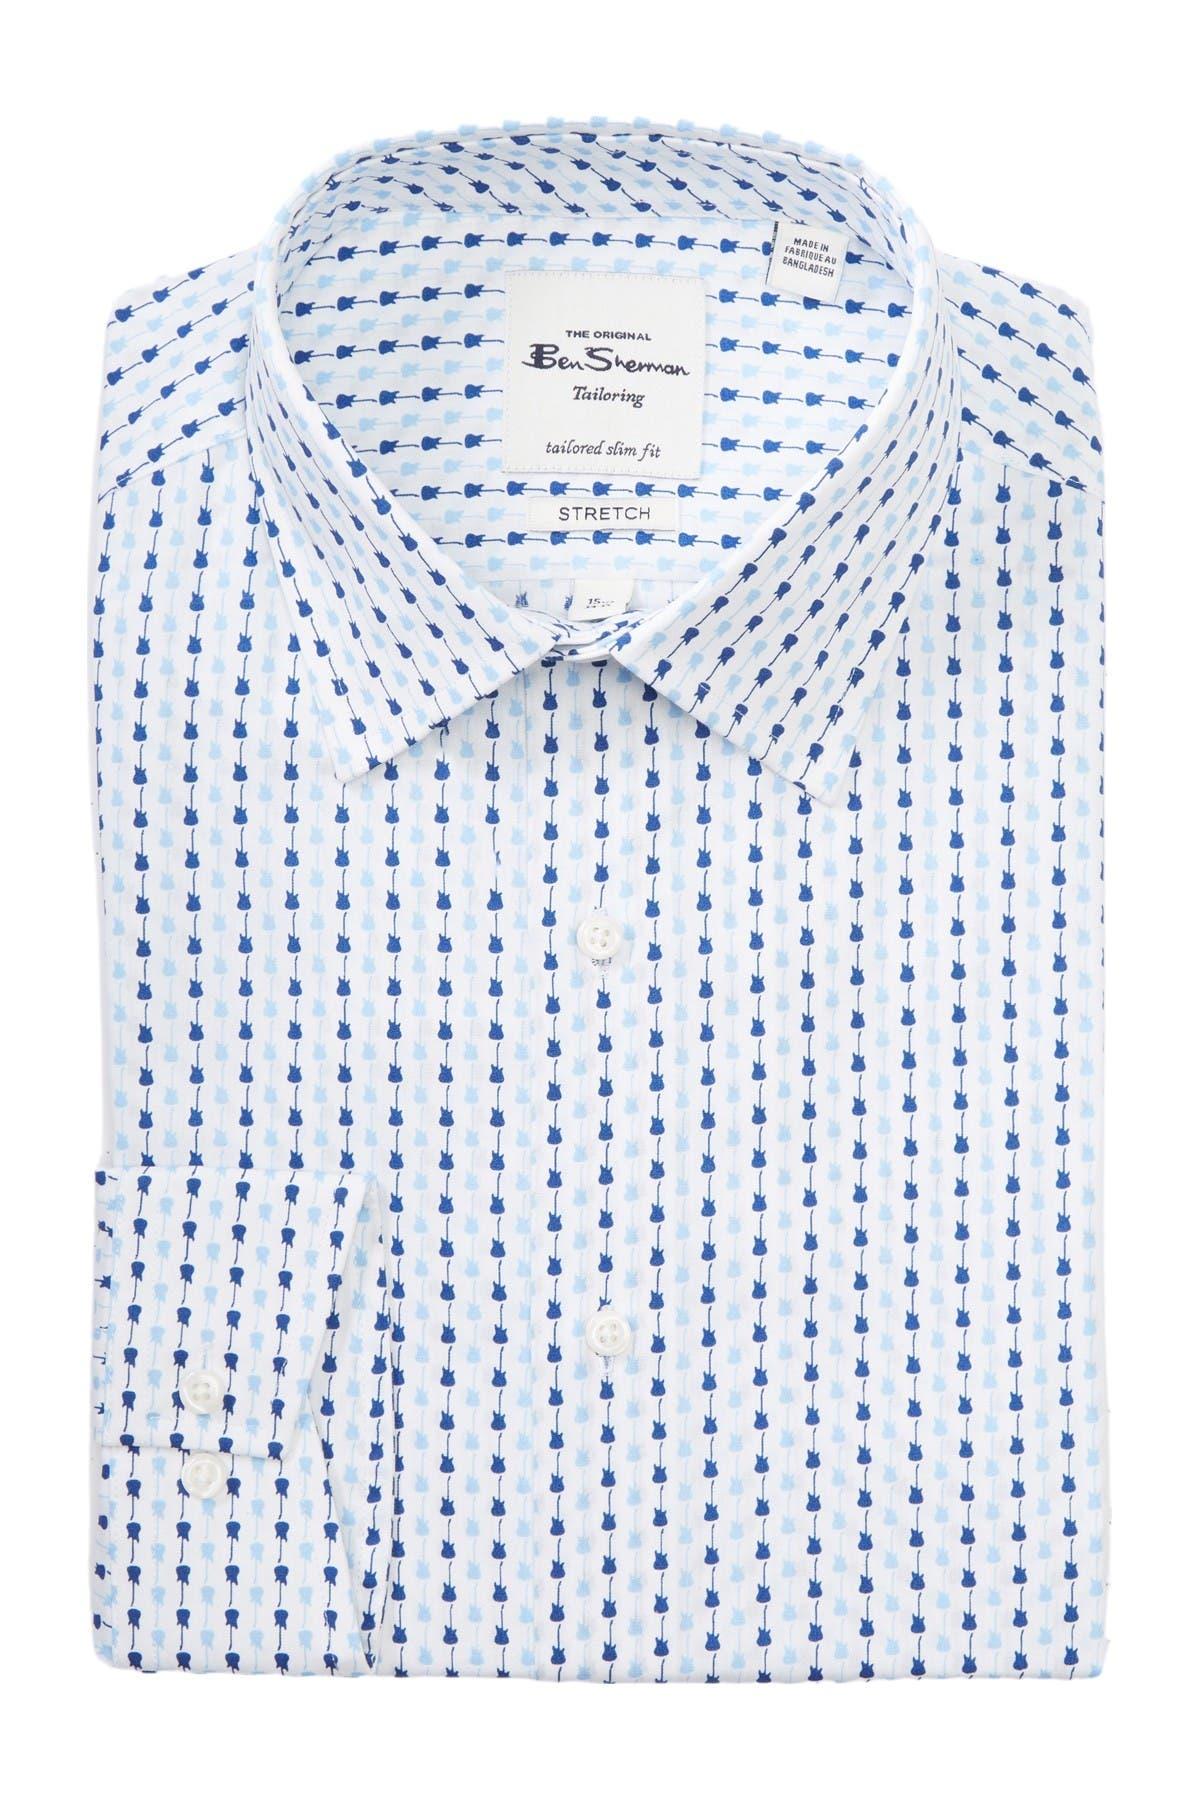 Image of Ben Sherman Guitar Print Tailored Slim Fit Dress Shirt